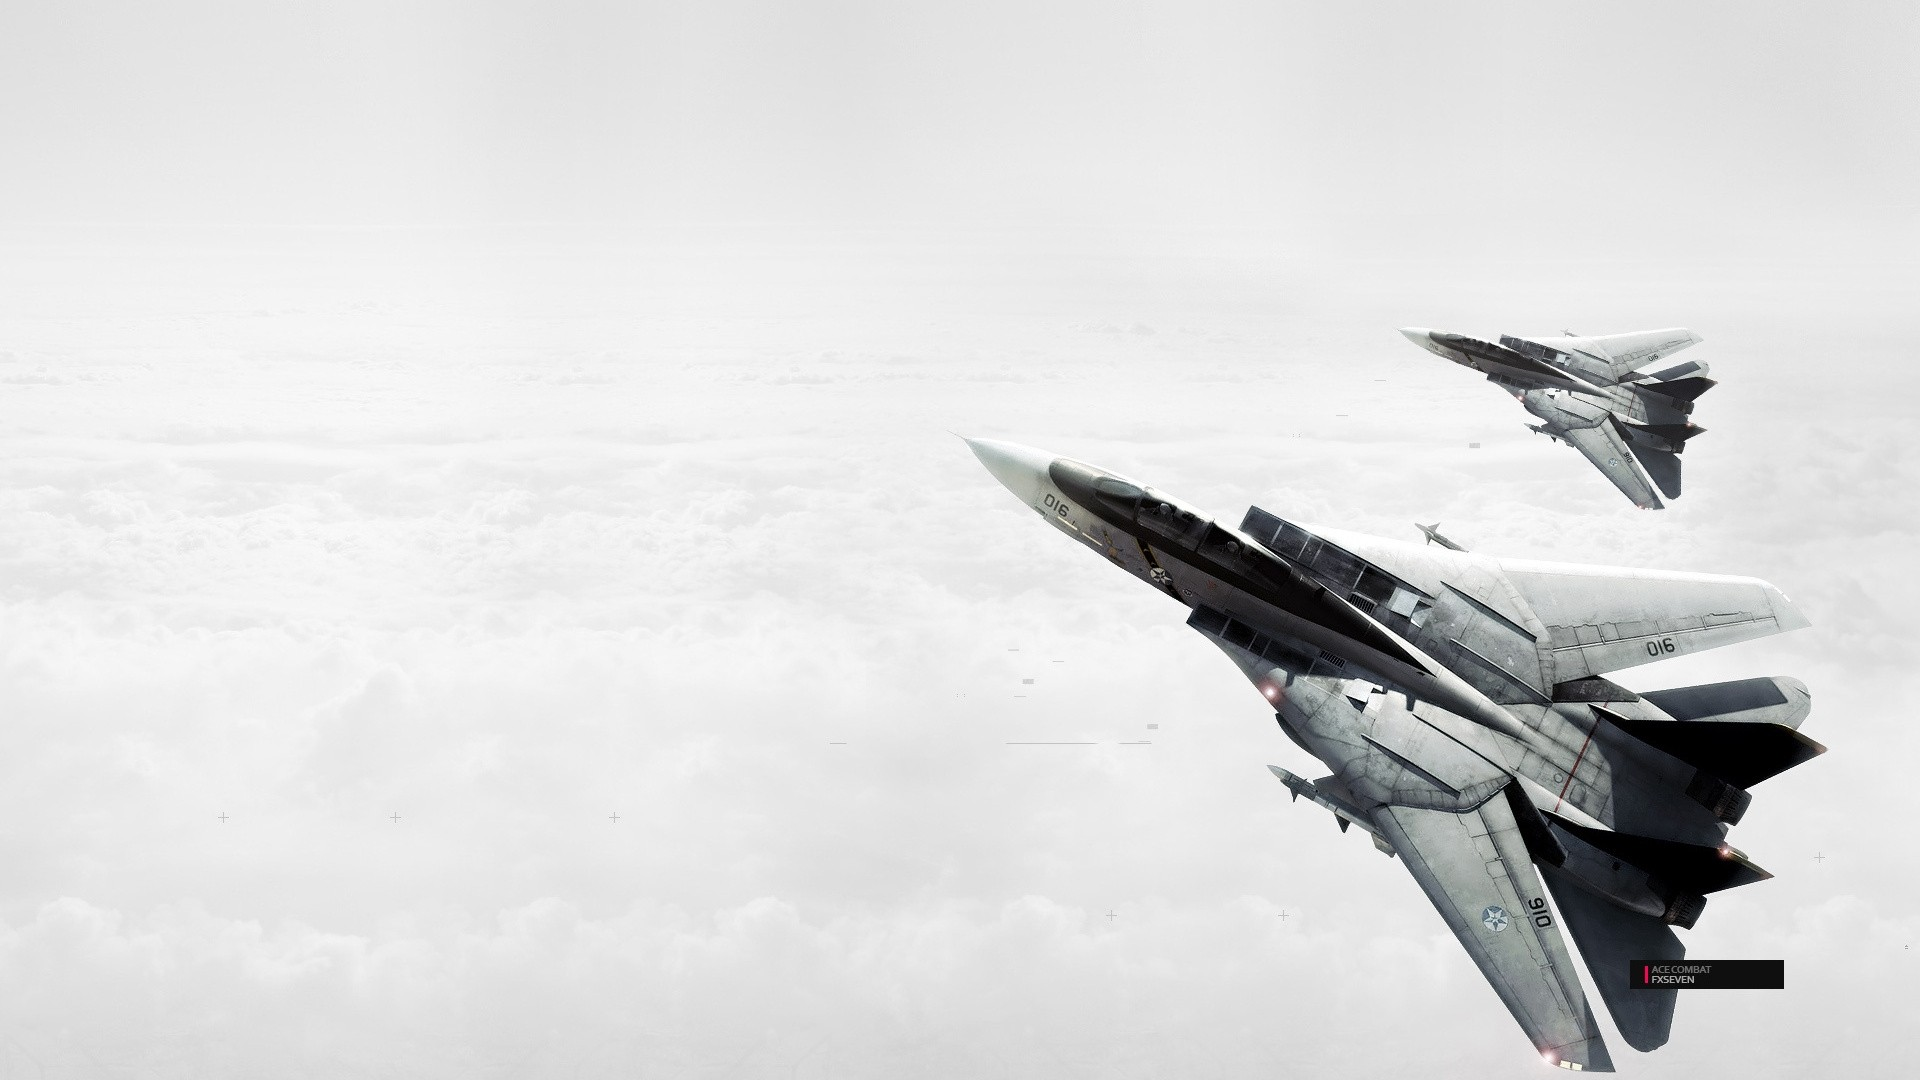 Ace Combat Free Wallpaper